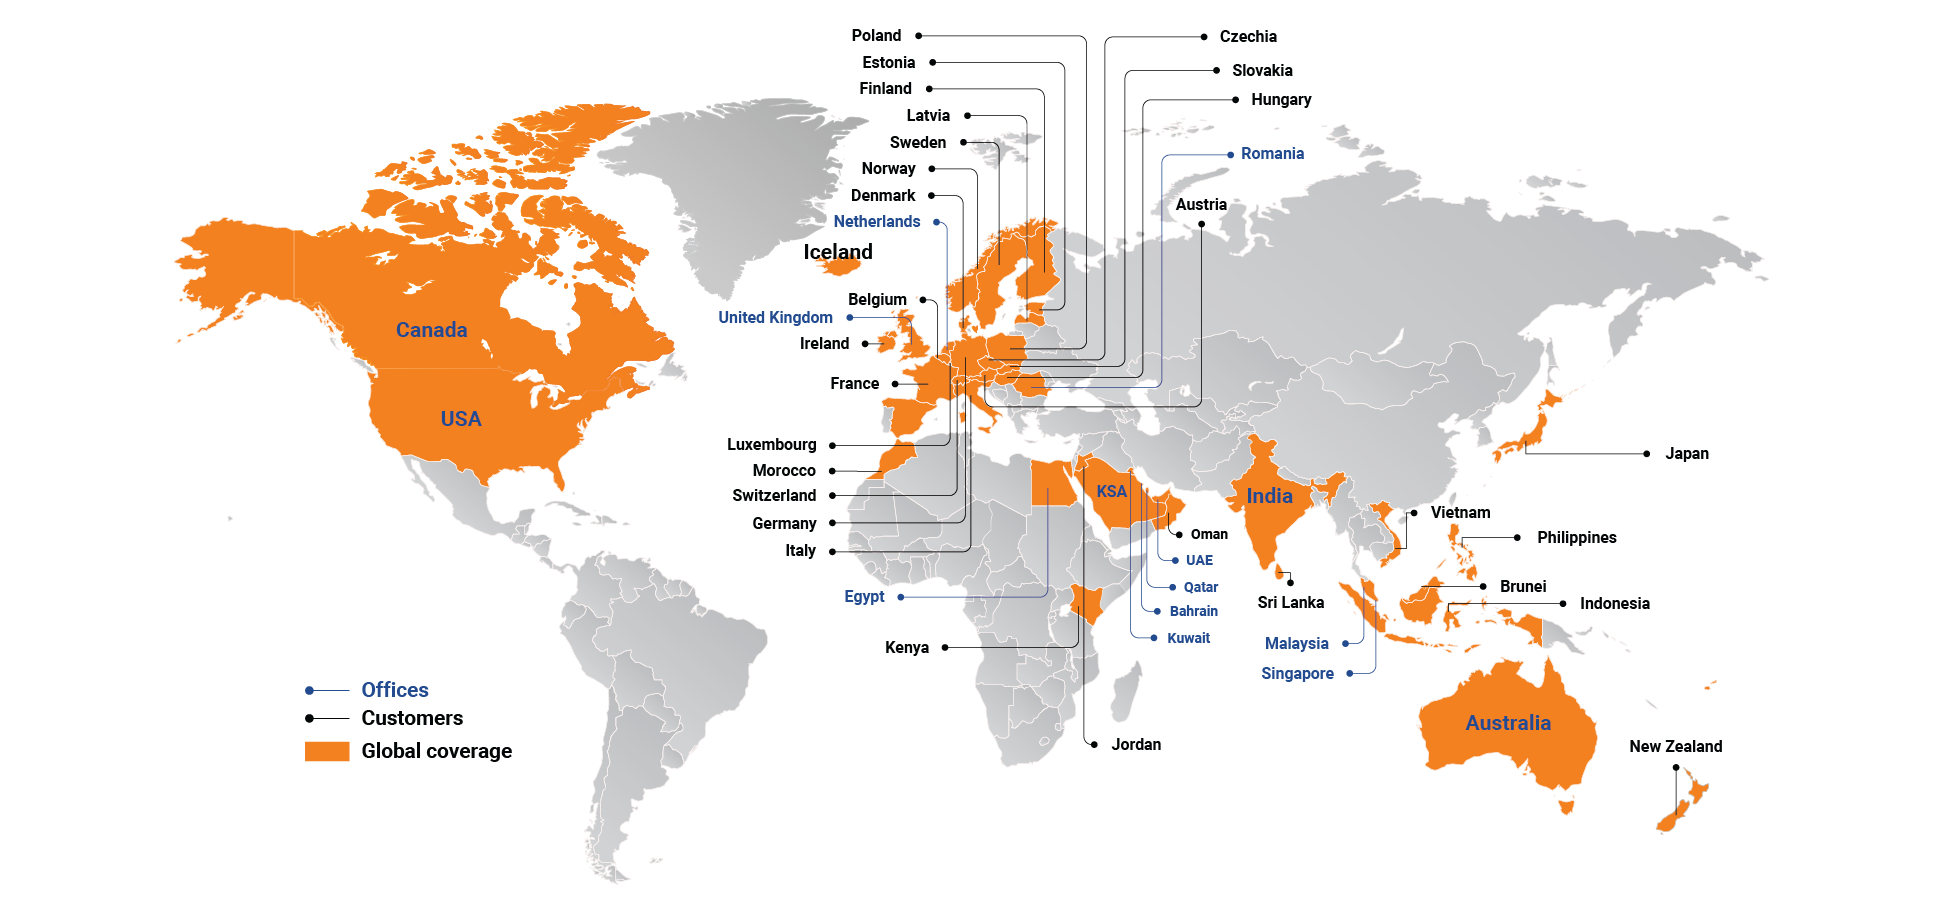 Contact Us | Evosys Global - ERP | CRM | EPM | Healthcare